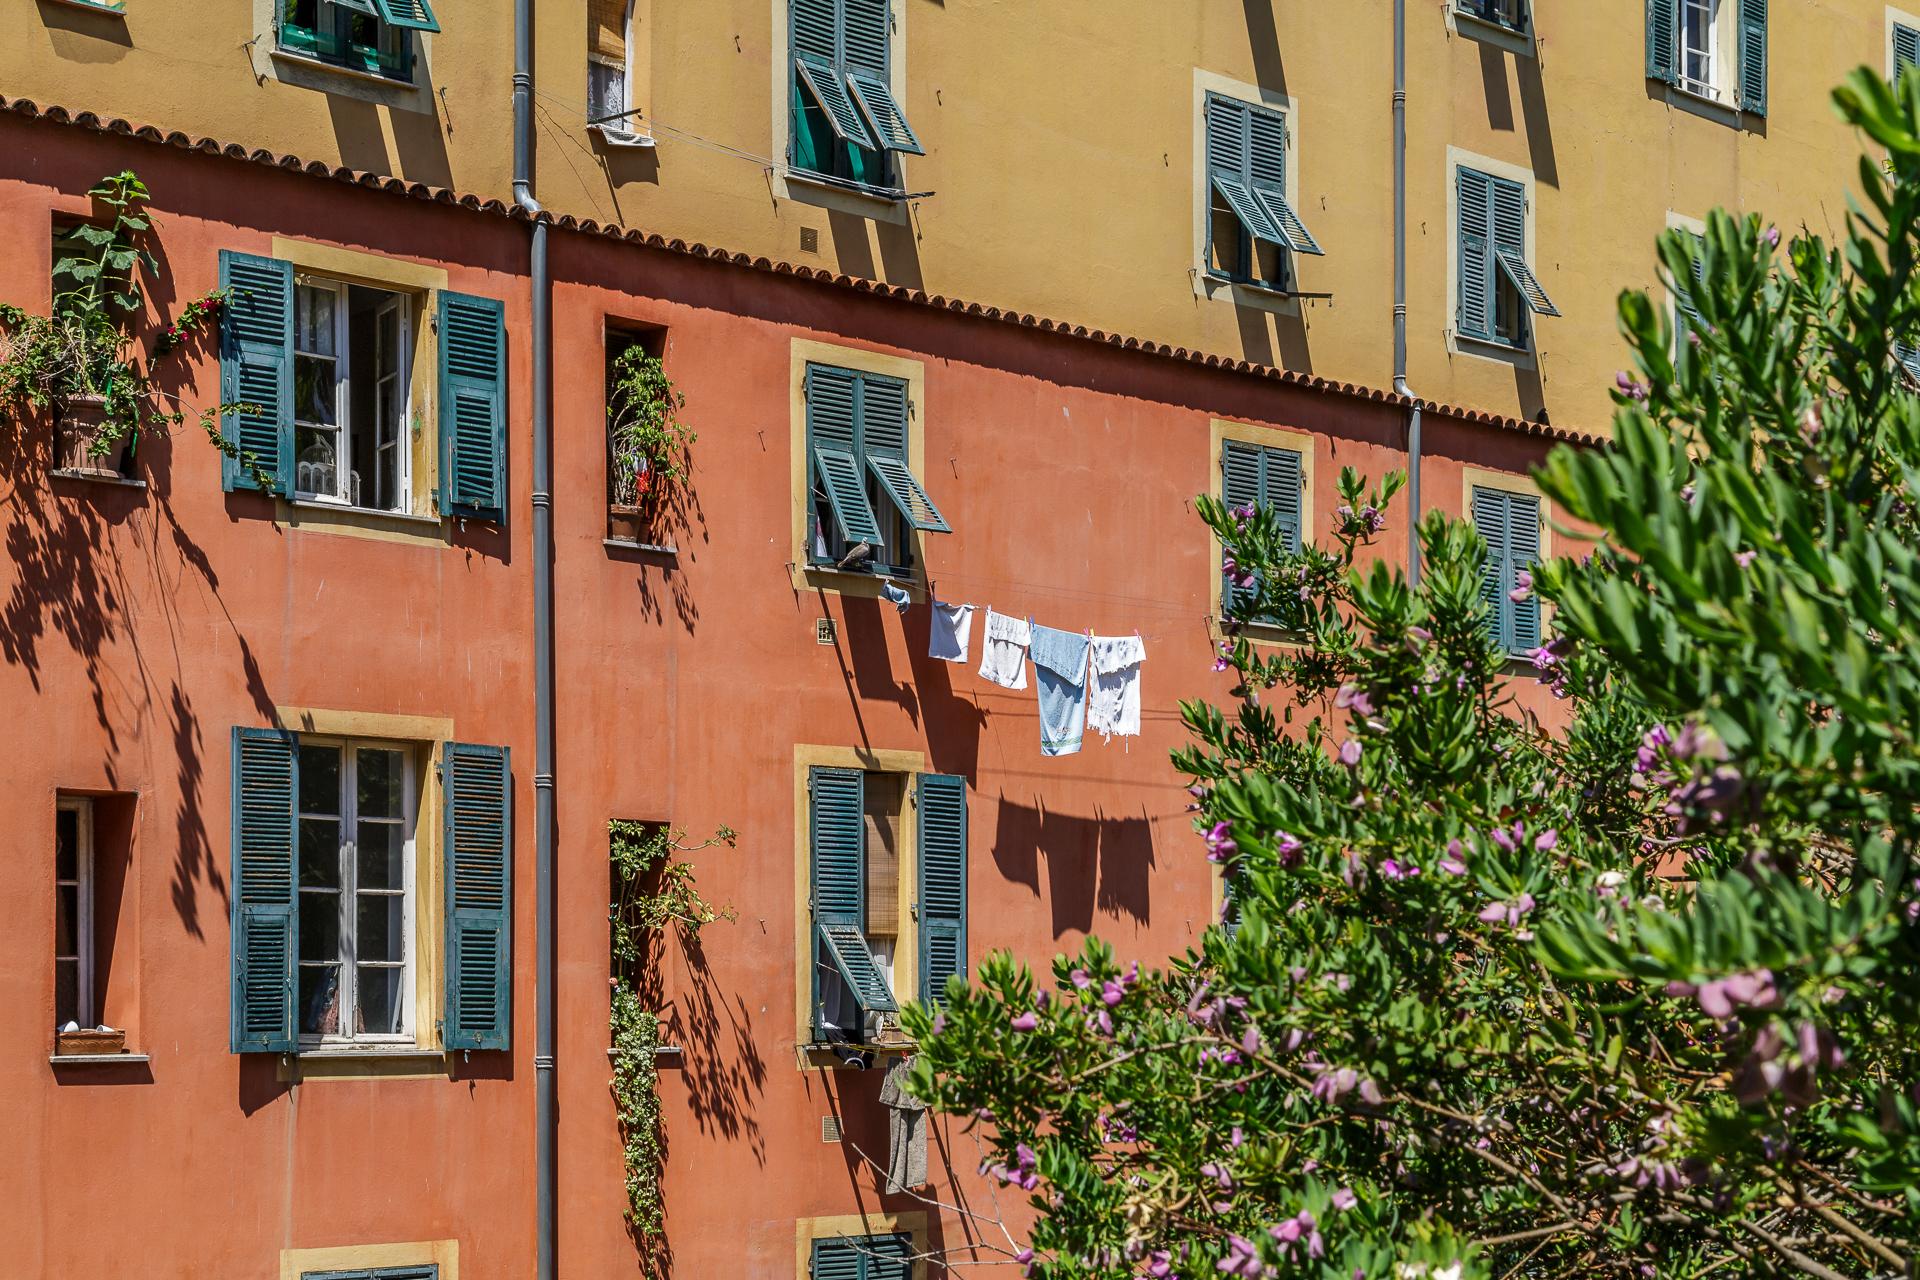 Vieux-Nice-9